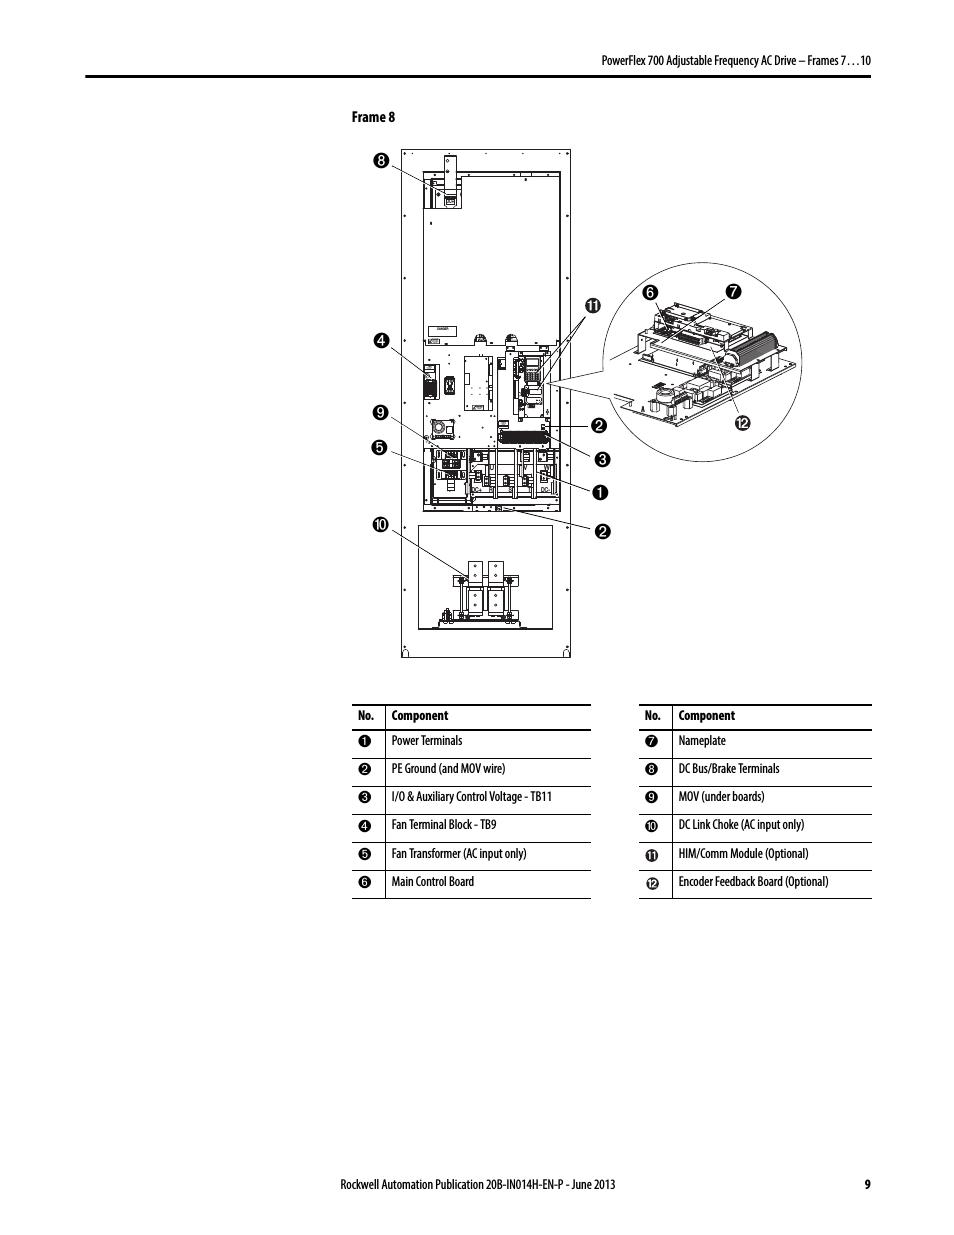 Powerflex 700 Wiring Diagram Database